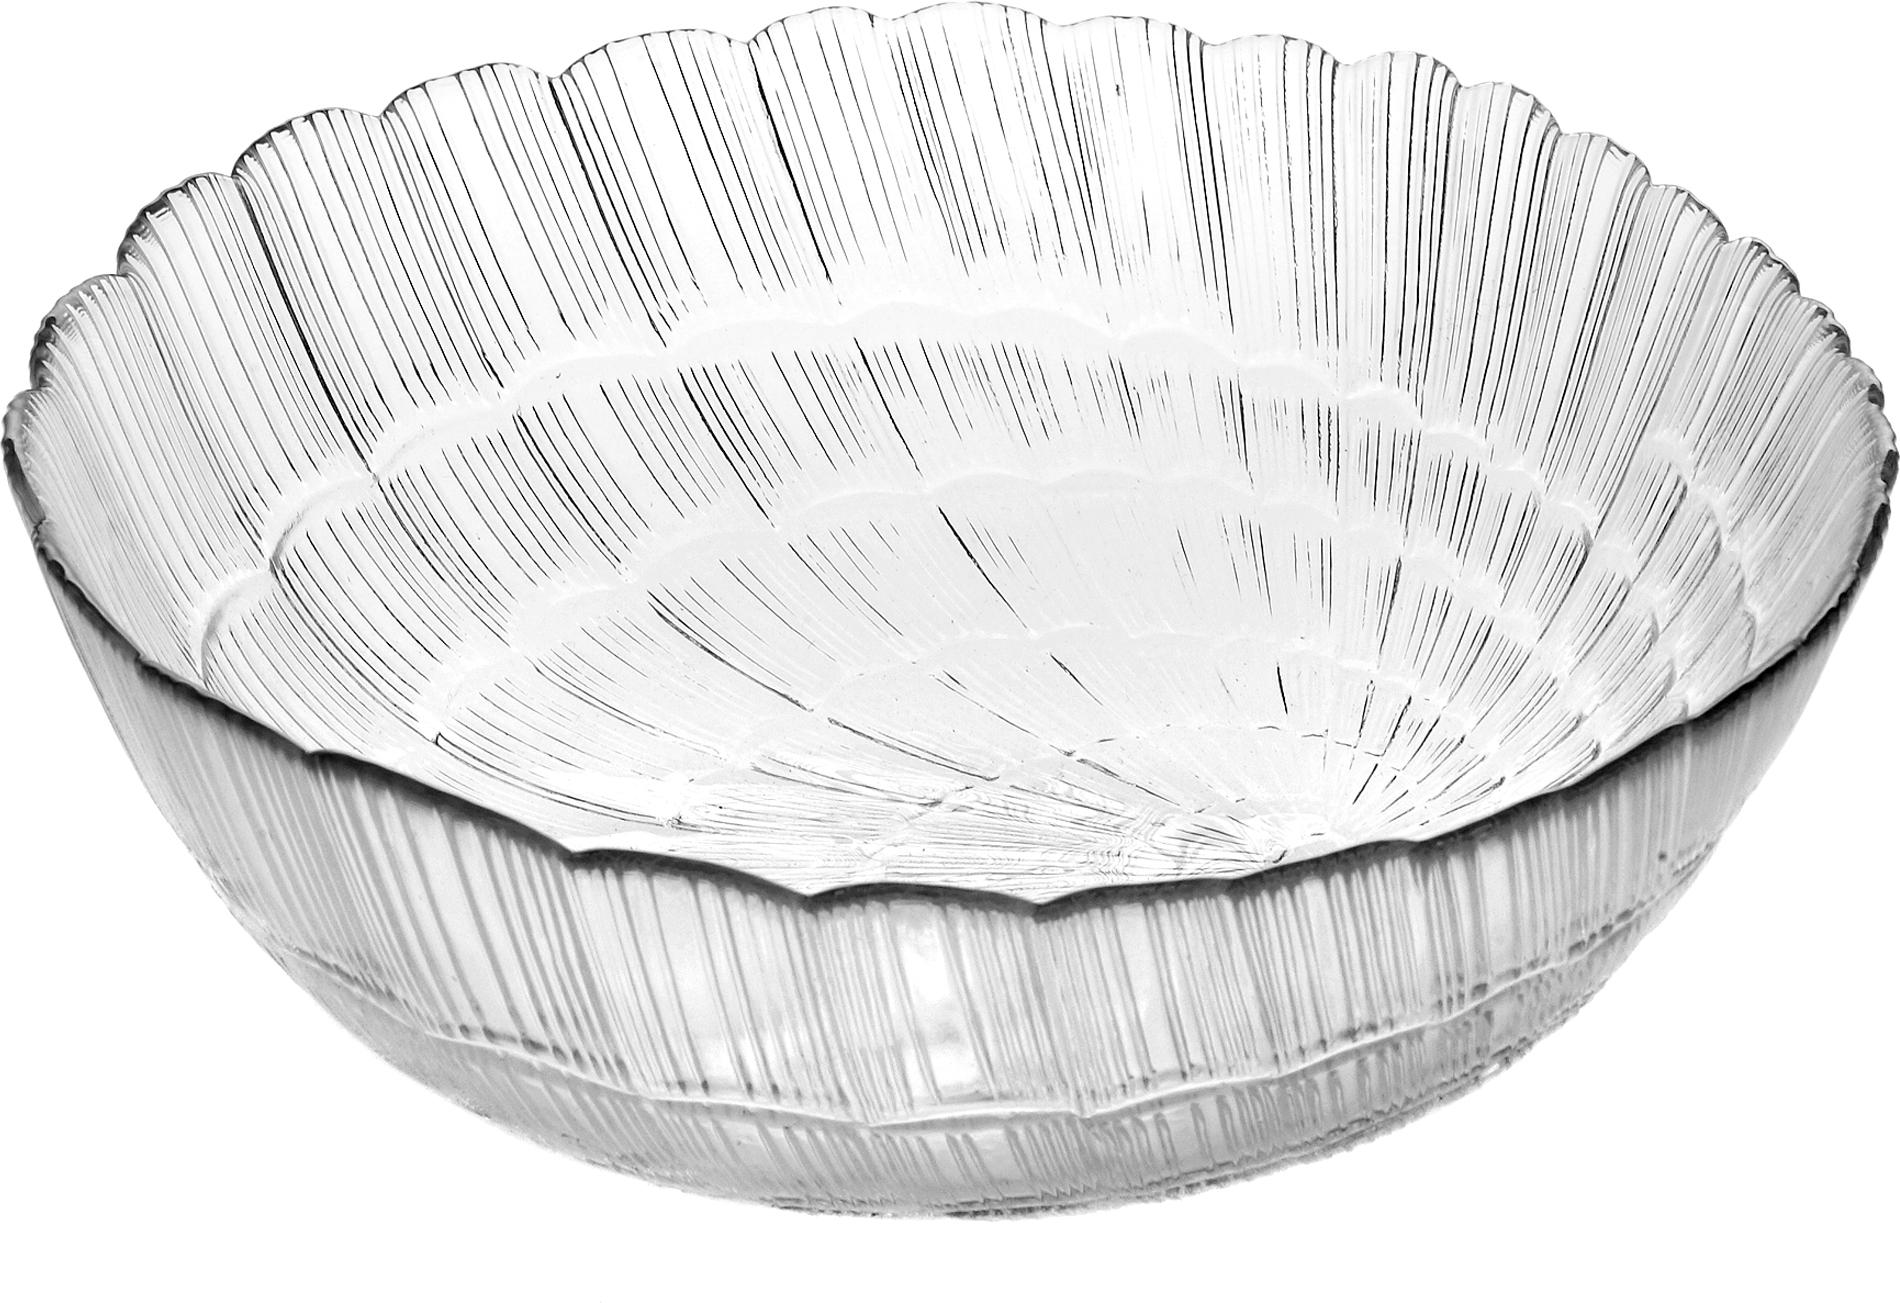 Салатник Pasabahce Атлантис, цвет: прозрачный, диаметр 12 см тарелка pasabahce атлантис цвет прозрачный диаметр 21 см